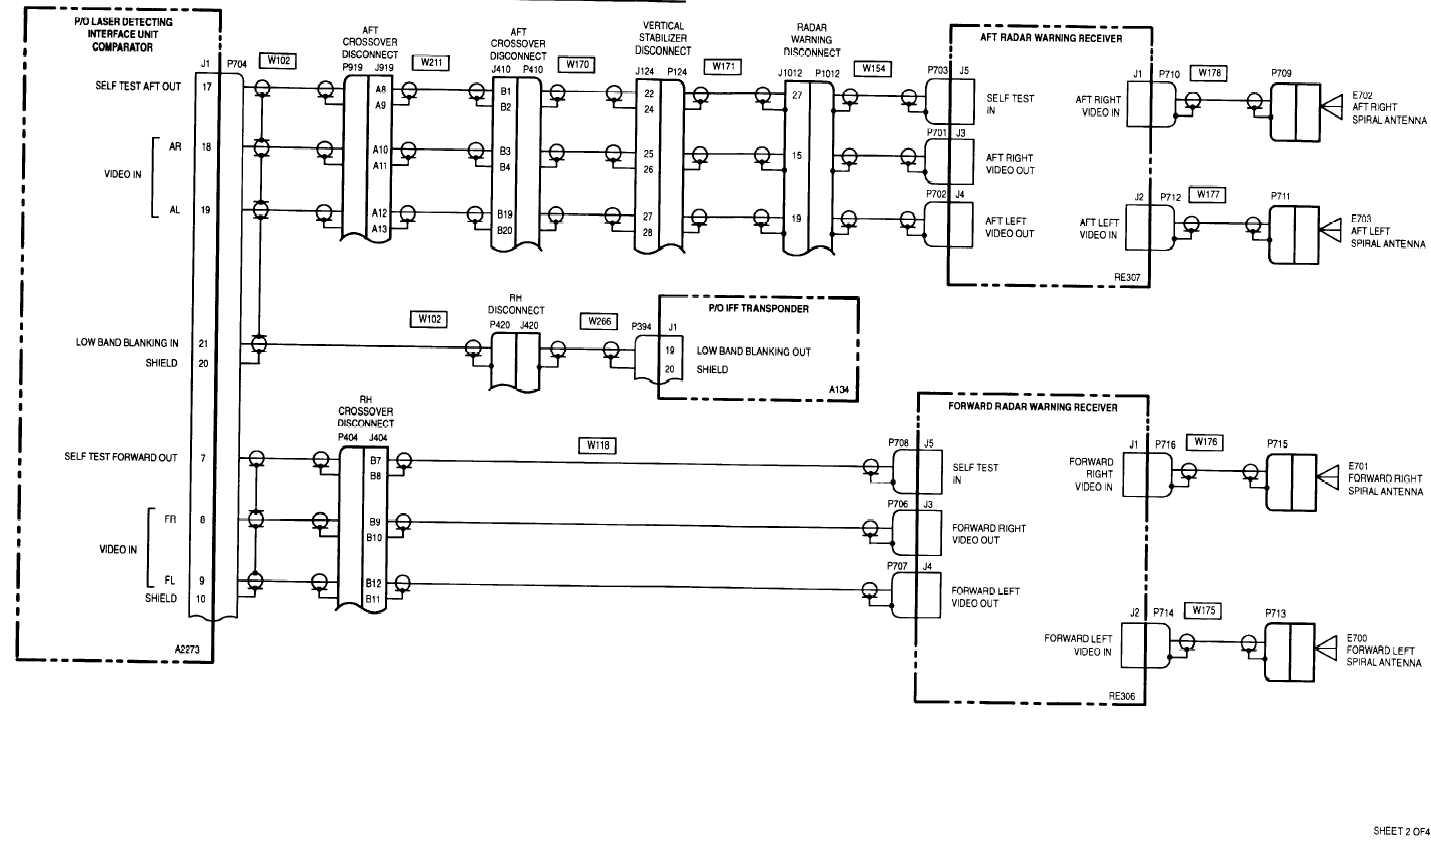 21 4 Laser Detecting Set An Avr 2av1 Adp Wiring Diagram Cont Change 7 9